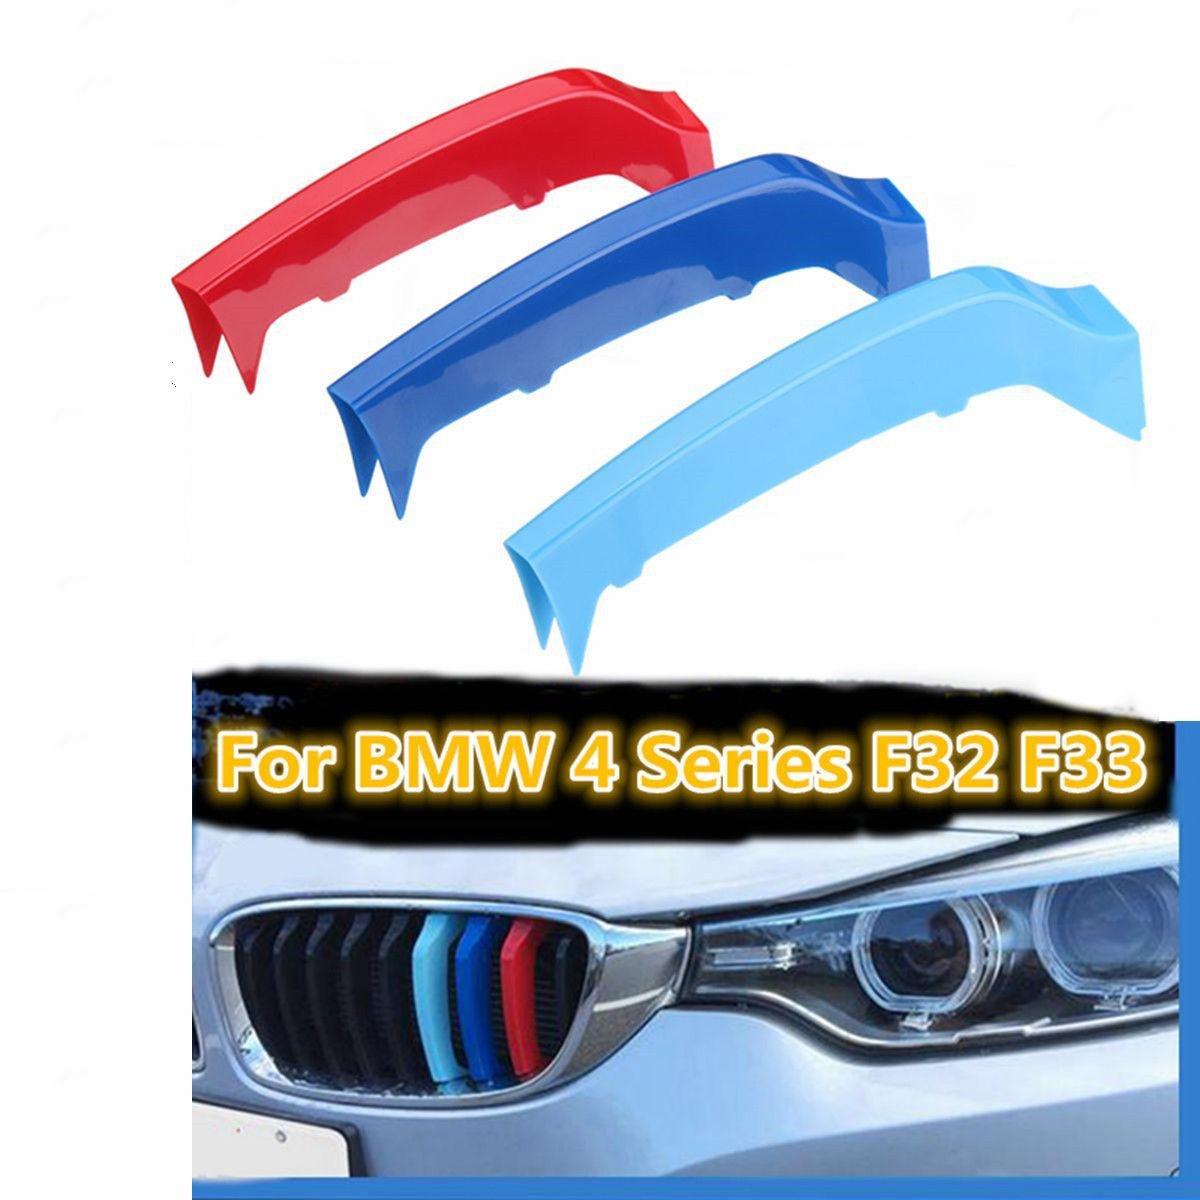 Fundas decorativas de rayas para la rejilla del capó , estilo deportivo, f32, f33, B M W serie 4 2014-2017, rejilla 9 M Power, M Sport Tech Biznon LTD